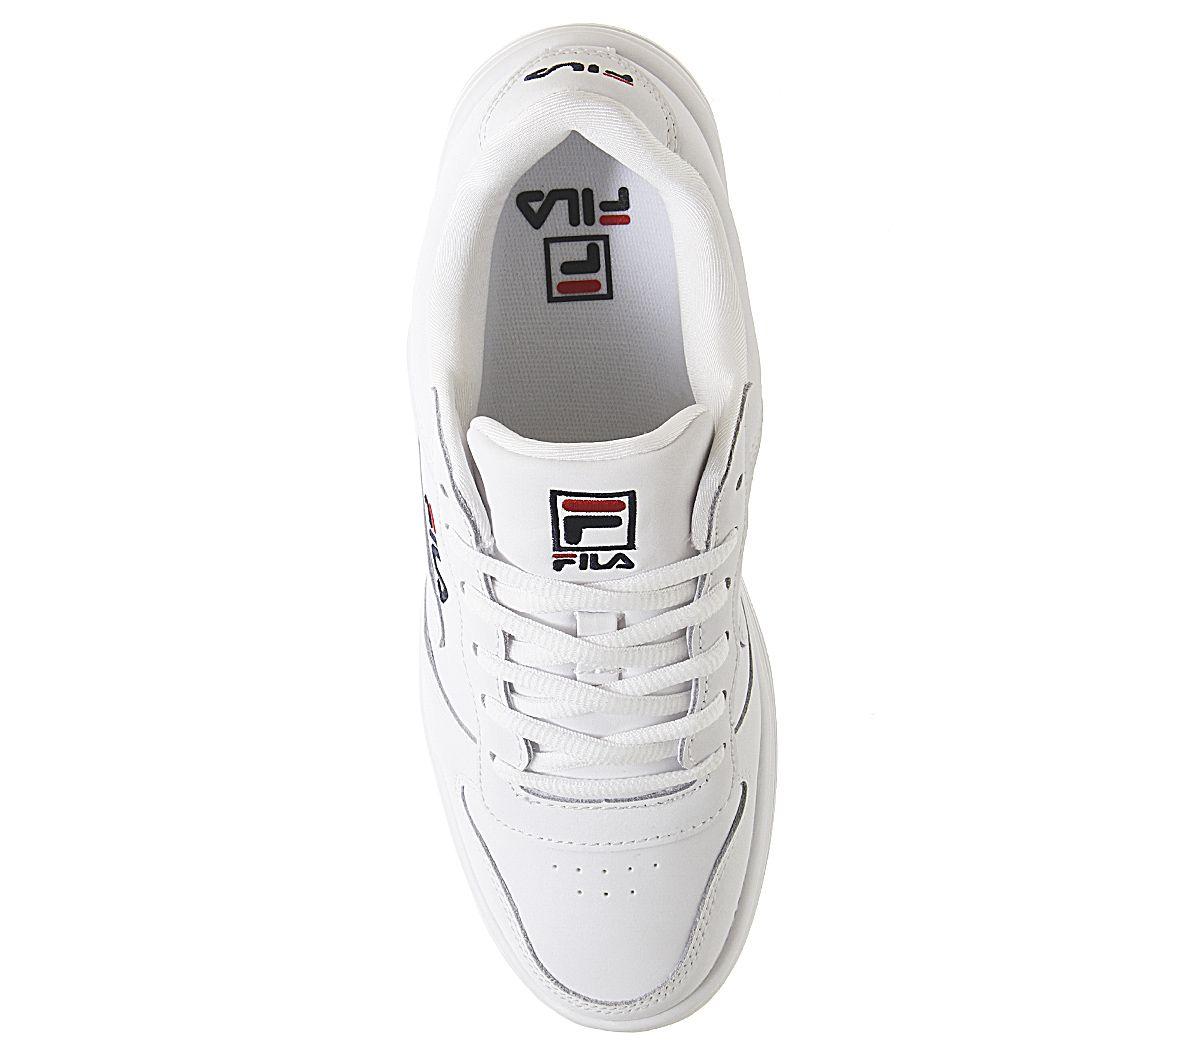 Debardeur-FILA-Wx-100-Trainers-White-FILA-Marine-Fila-Rouge-Baskets miniature 4